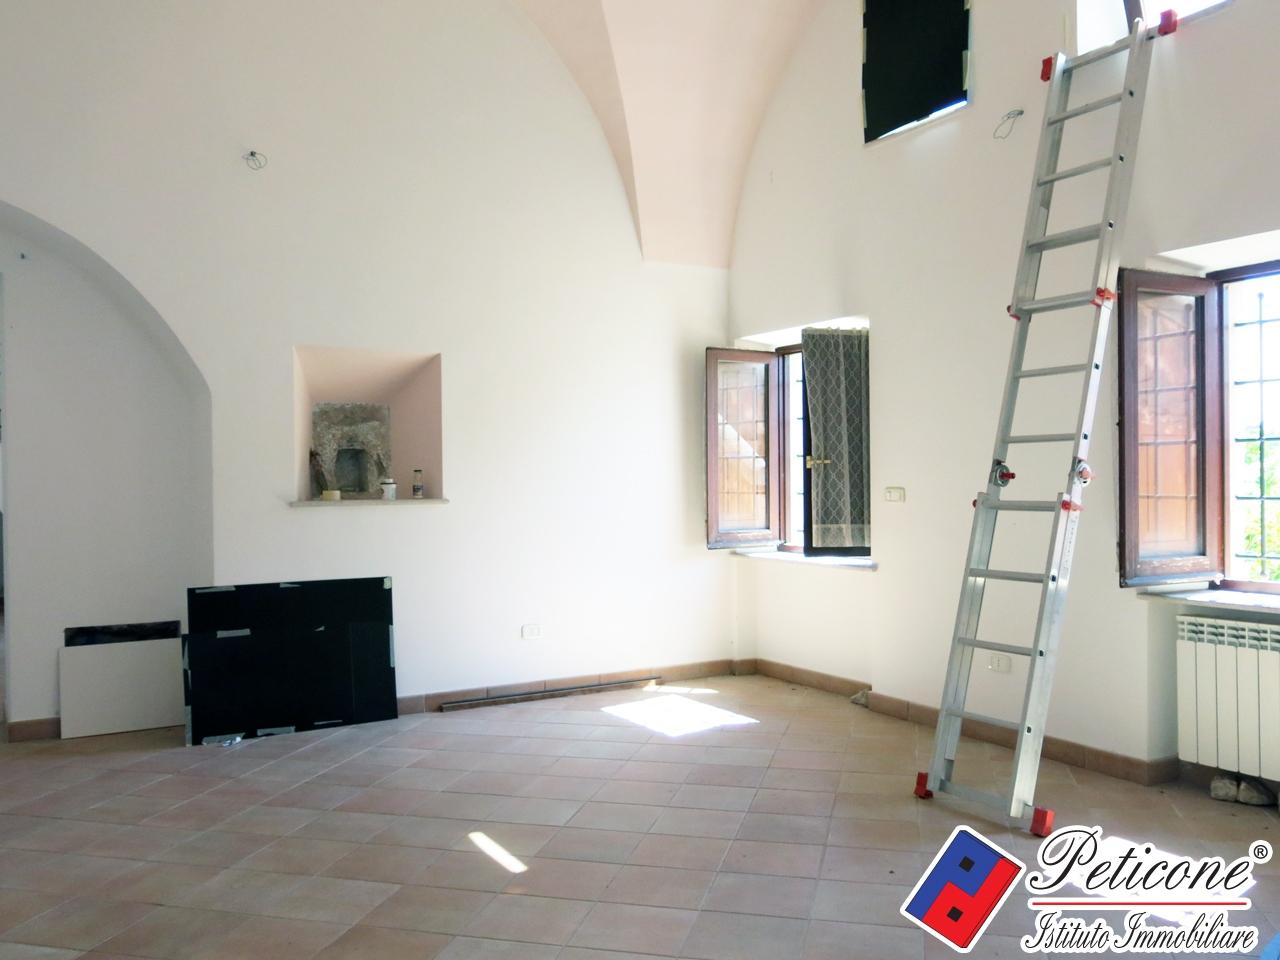 Villa in Vendita a Gaeta: 5 locali, 250 mq - Foto 25